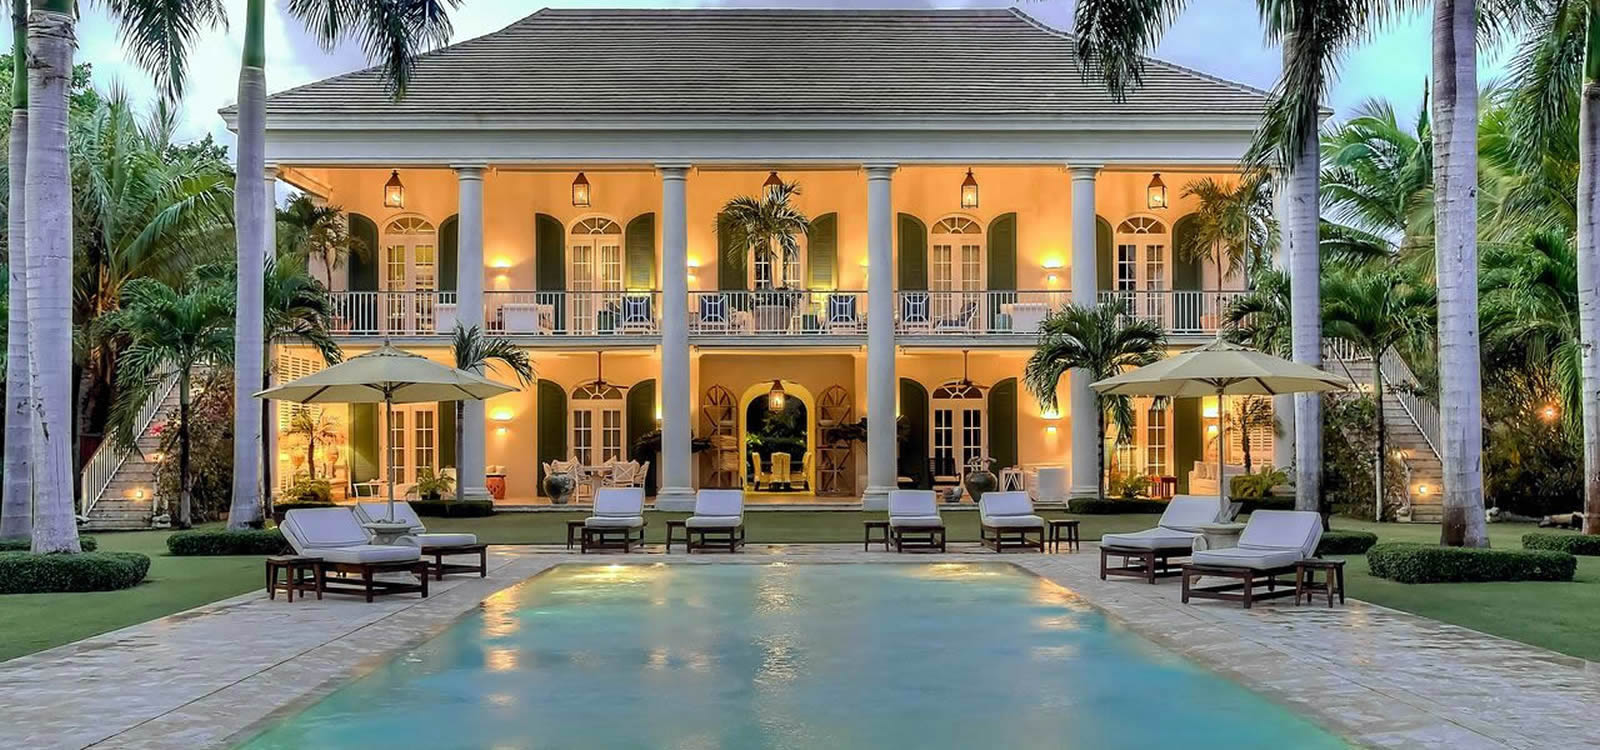 9 Bedroom Luxury House For Sale Arrecife Punta Cana Dominican Republic 7th Heaven Properties